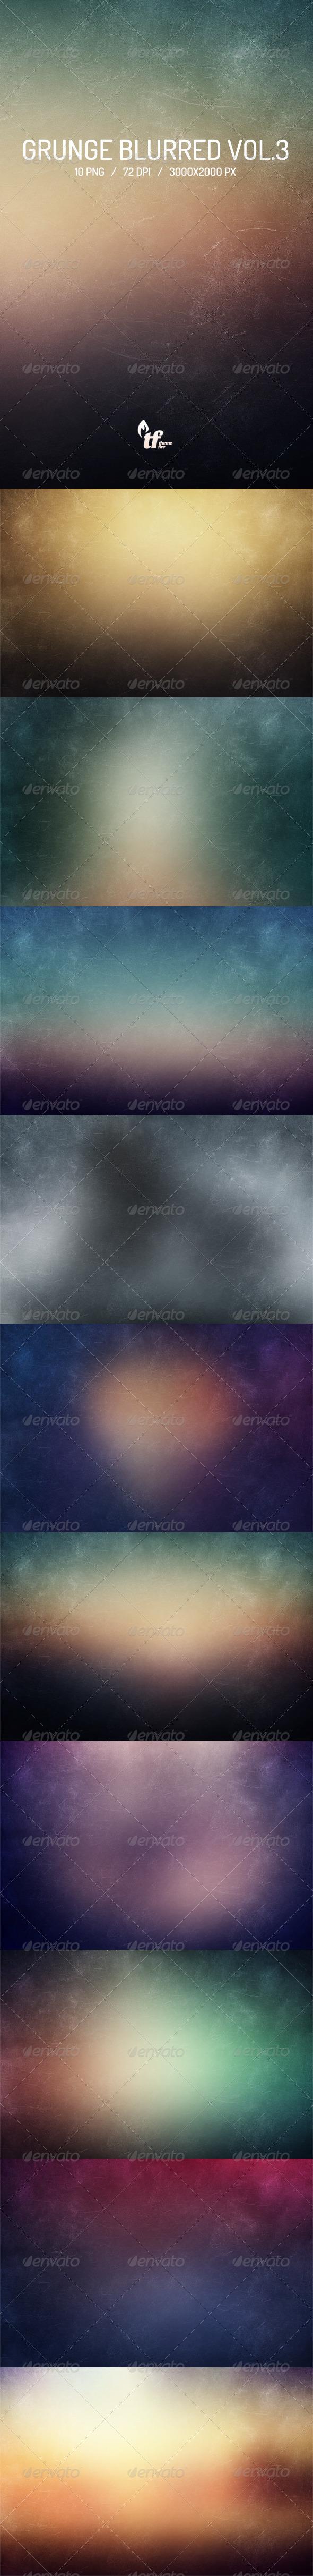 GraphicRiver Grunge Blurred Backgrounds Vol.3 7066594